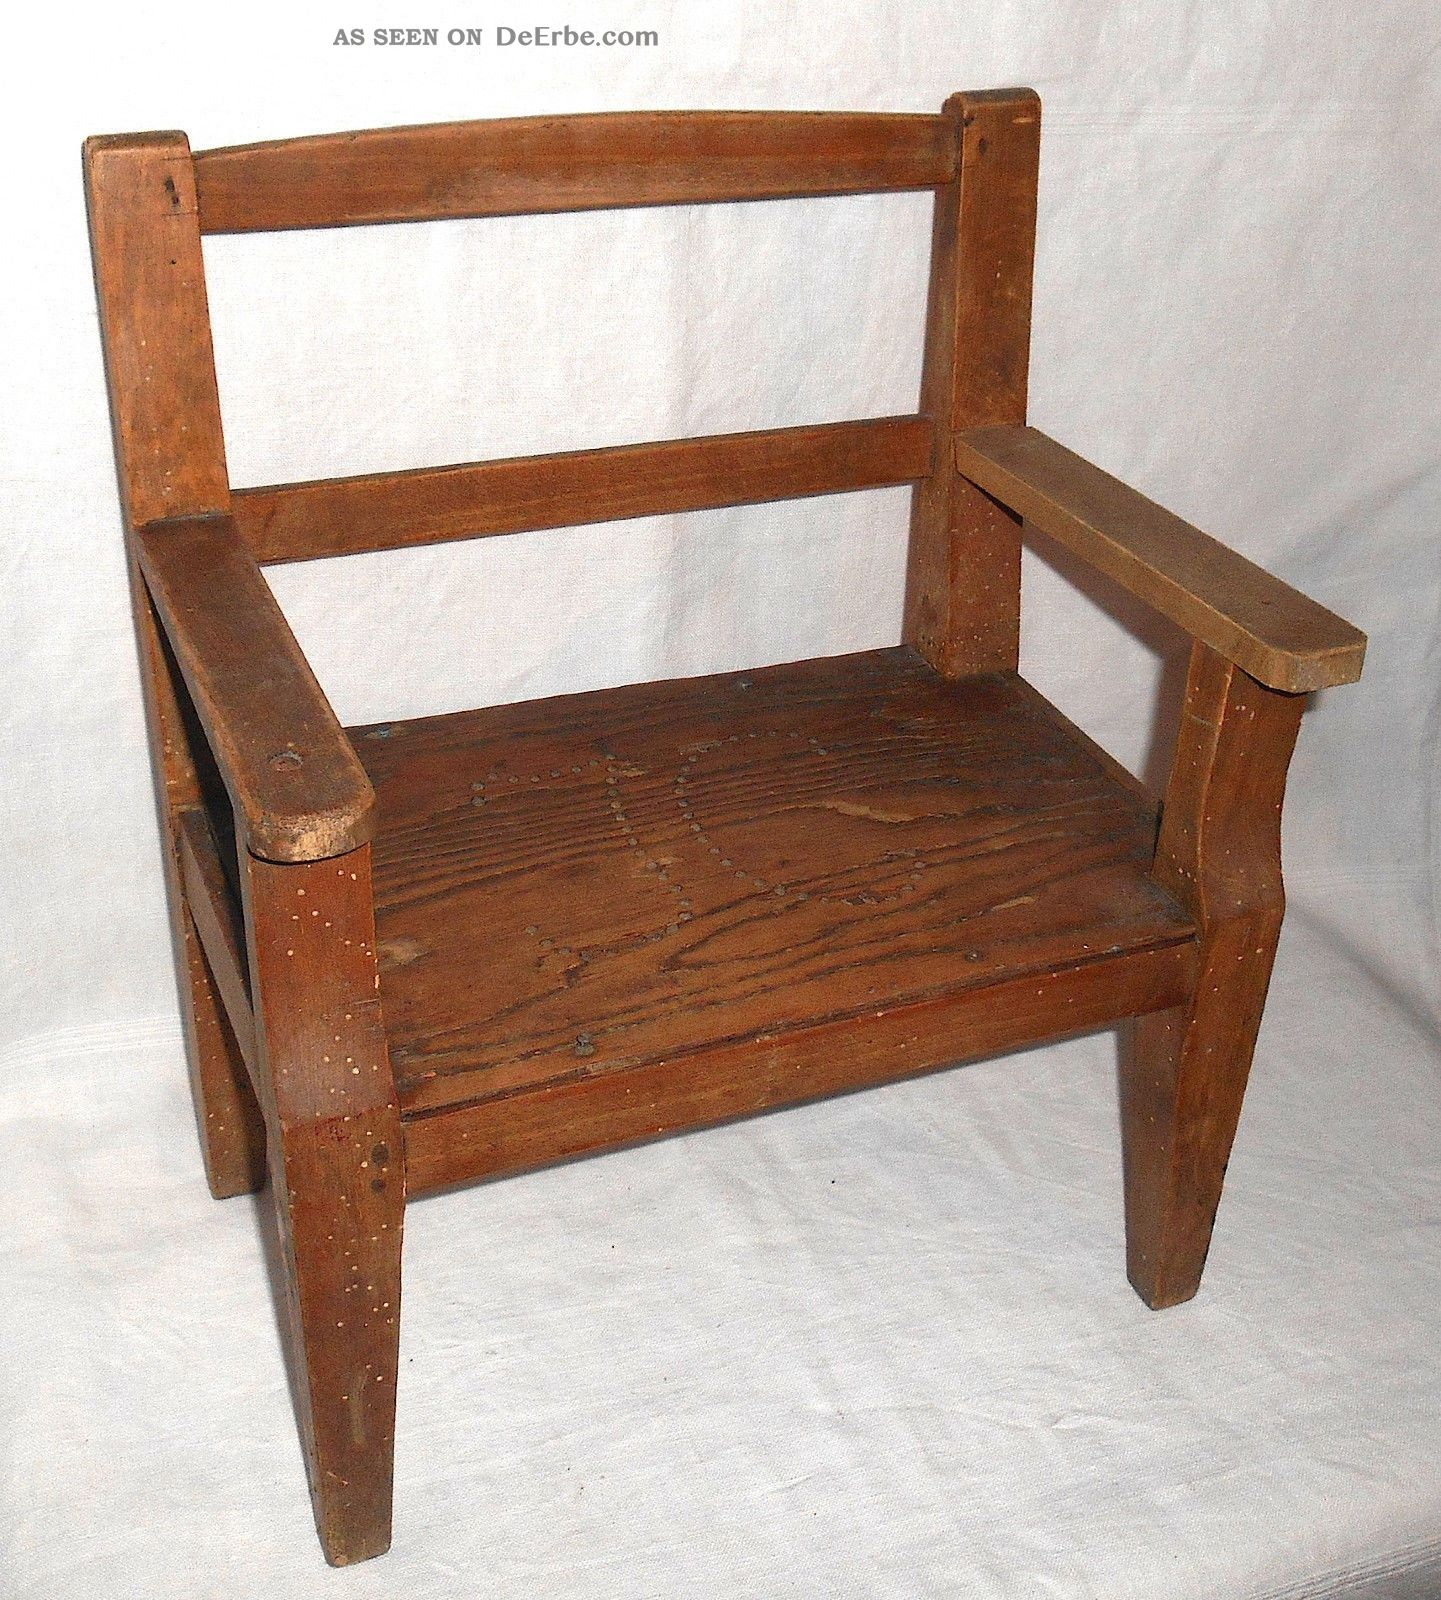 Antiker stuhl f r kleinkinder b nckchen evetuell f r den teddyb r 35 cm lang - Stuhl fur kleinkinder ...